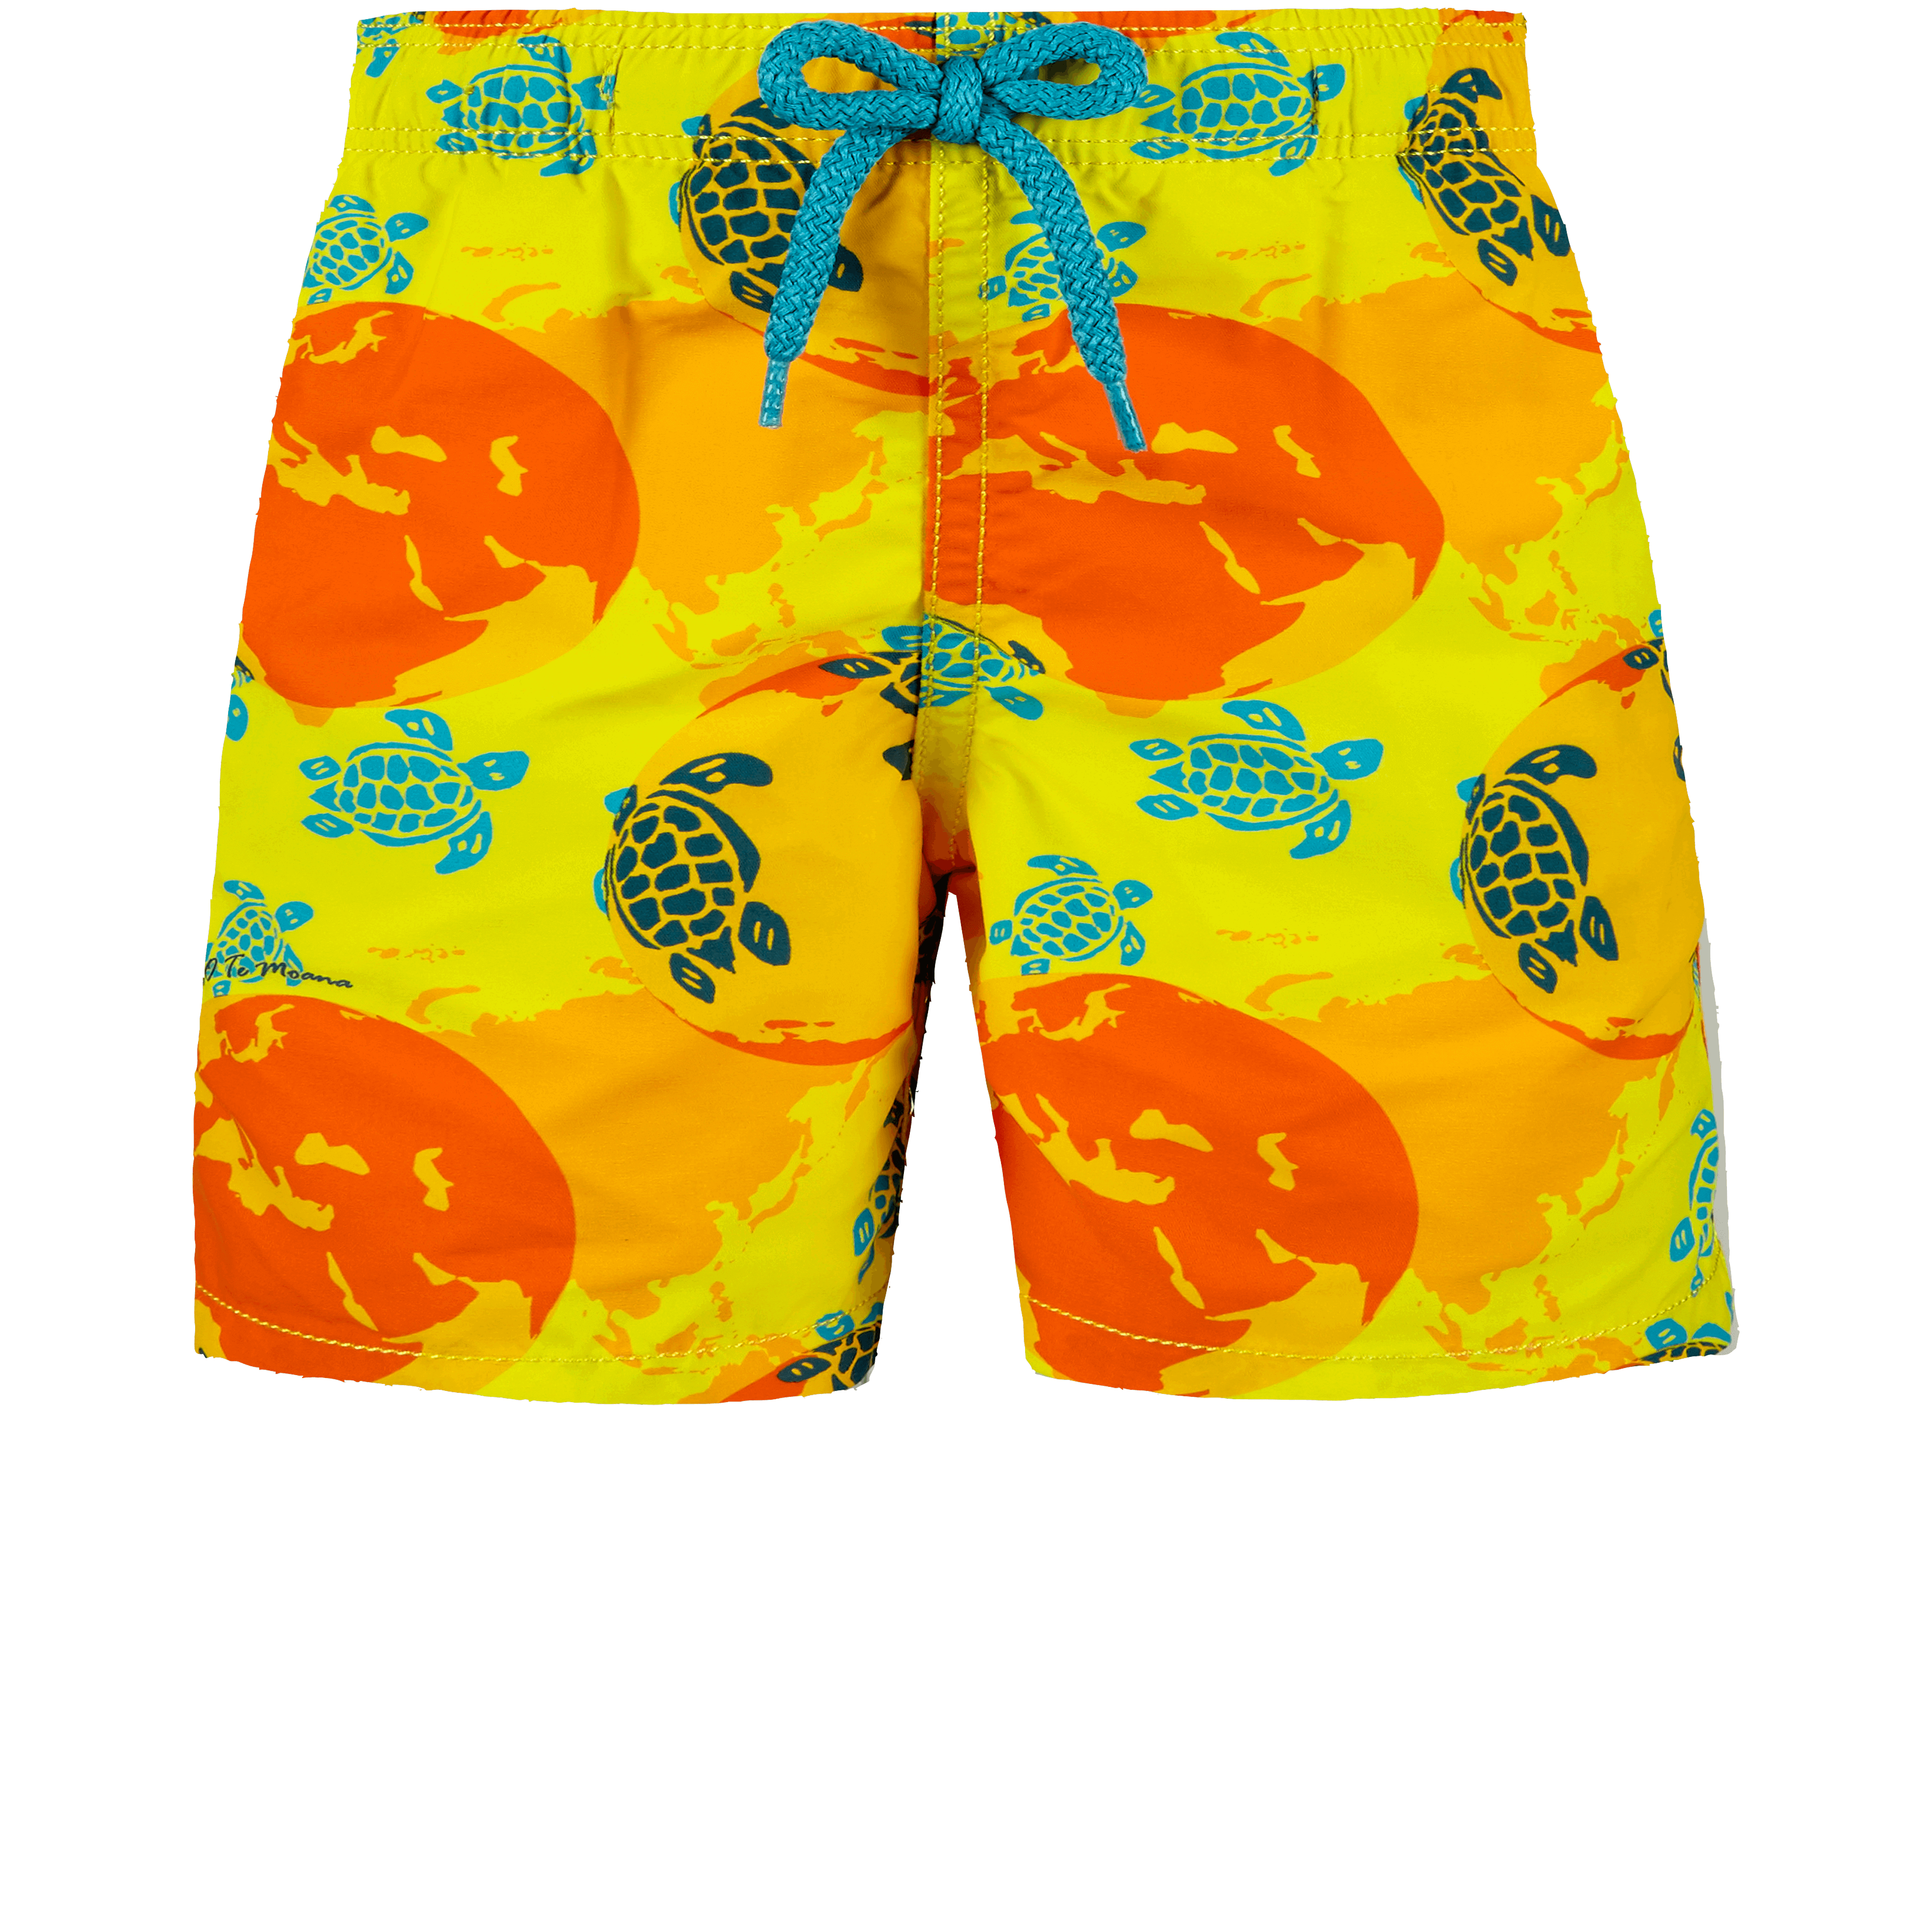 VILEBREQUIN | Boys Swimwear - Boys Swimwear Mappemonde Dots - Te Mana o Te Moana - SWIMMING TRUNK - JIM - - 14 - Vilebrequin | Goxip